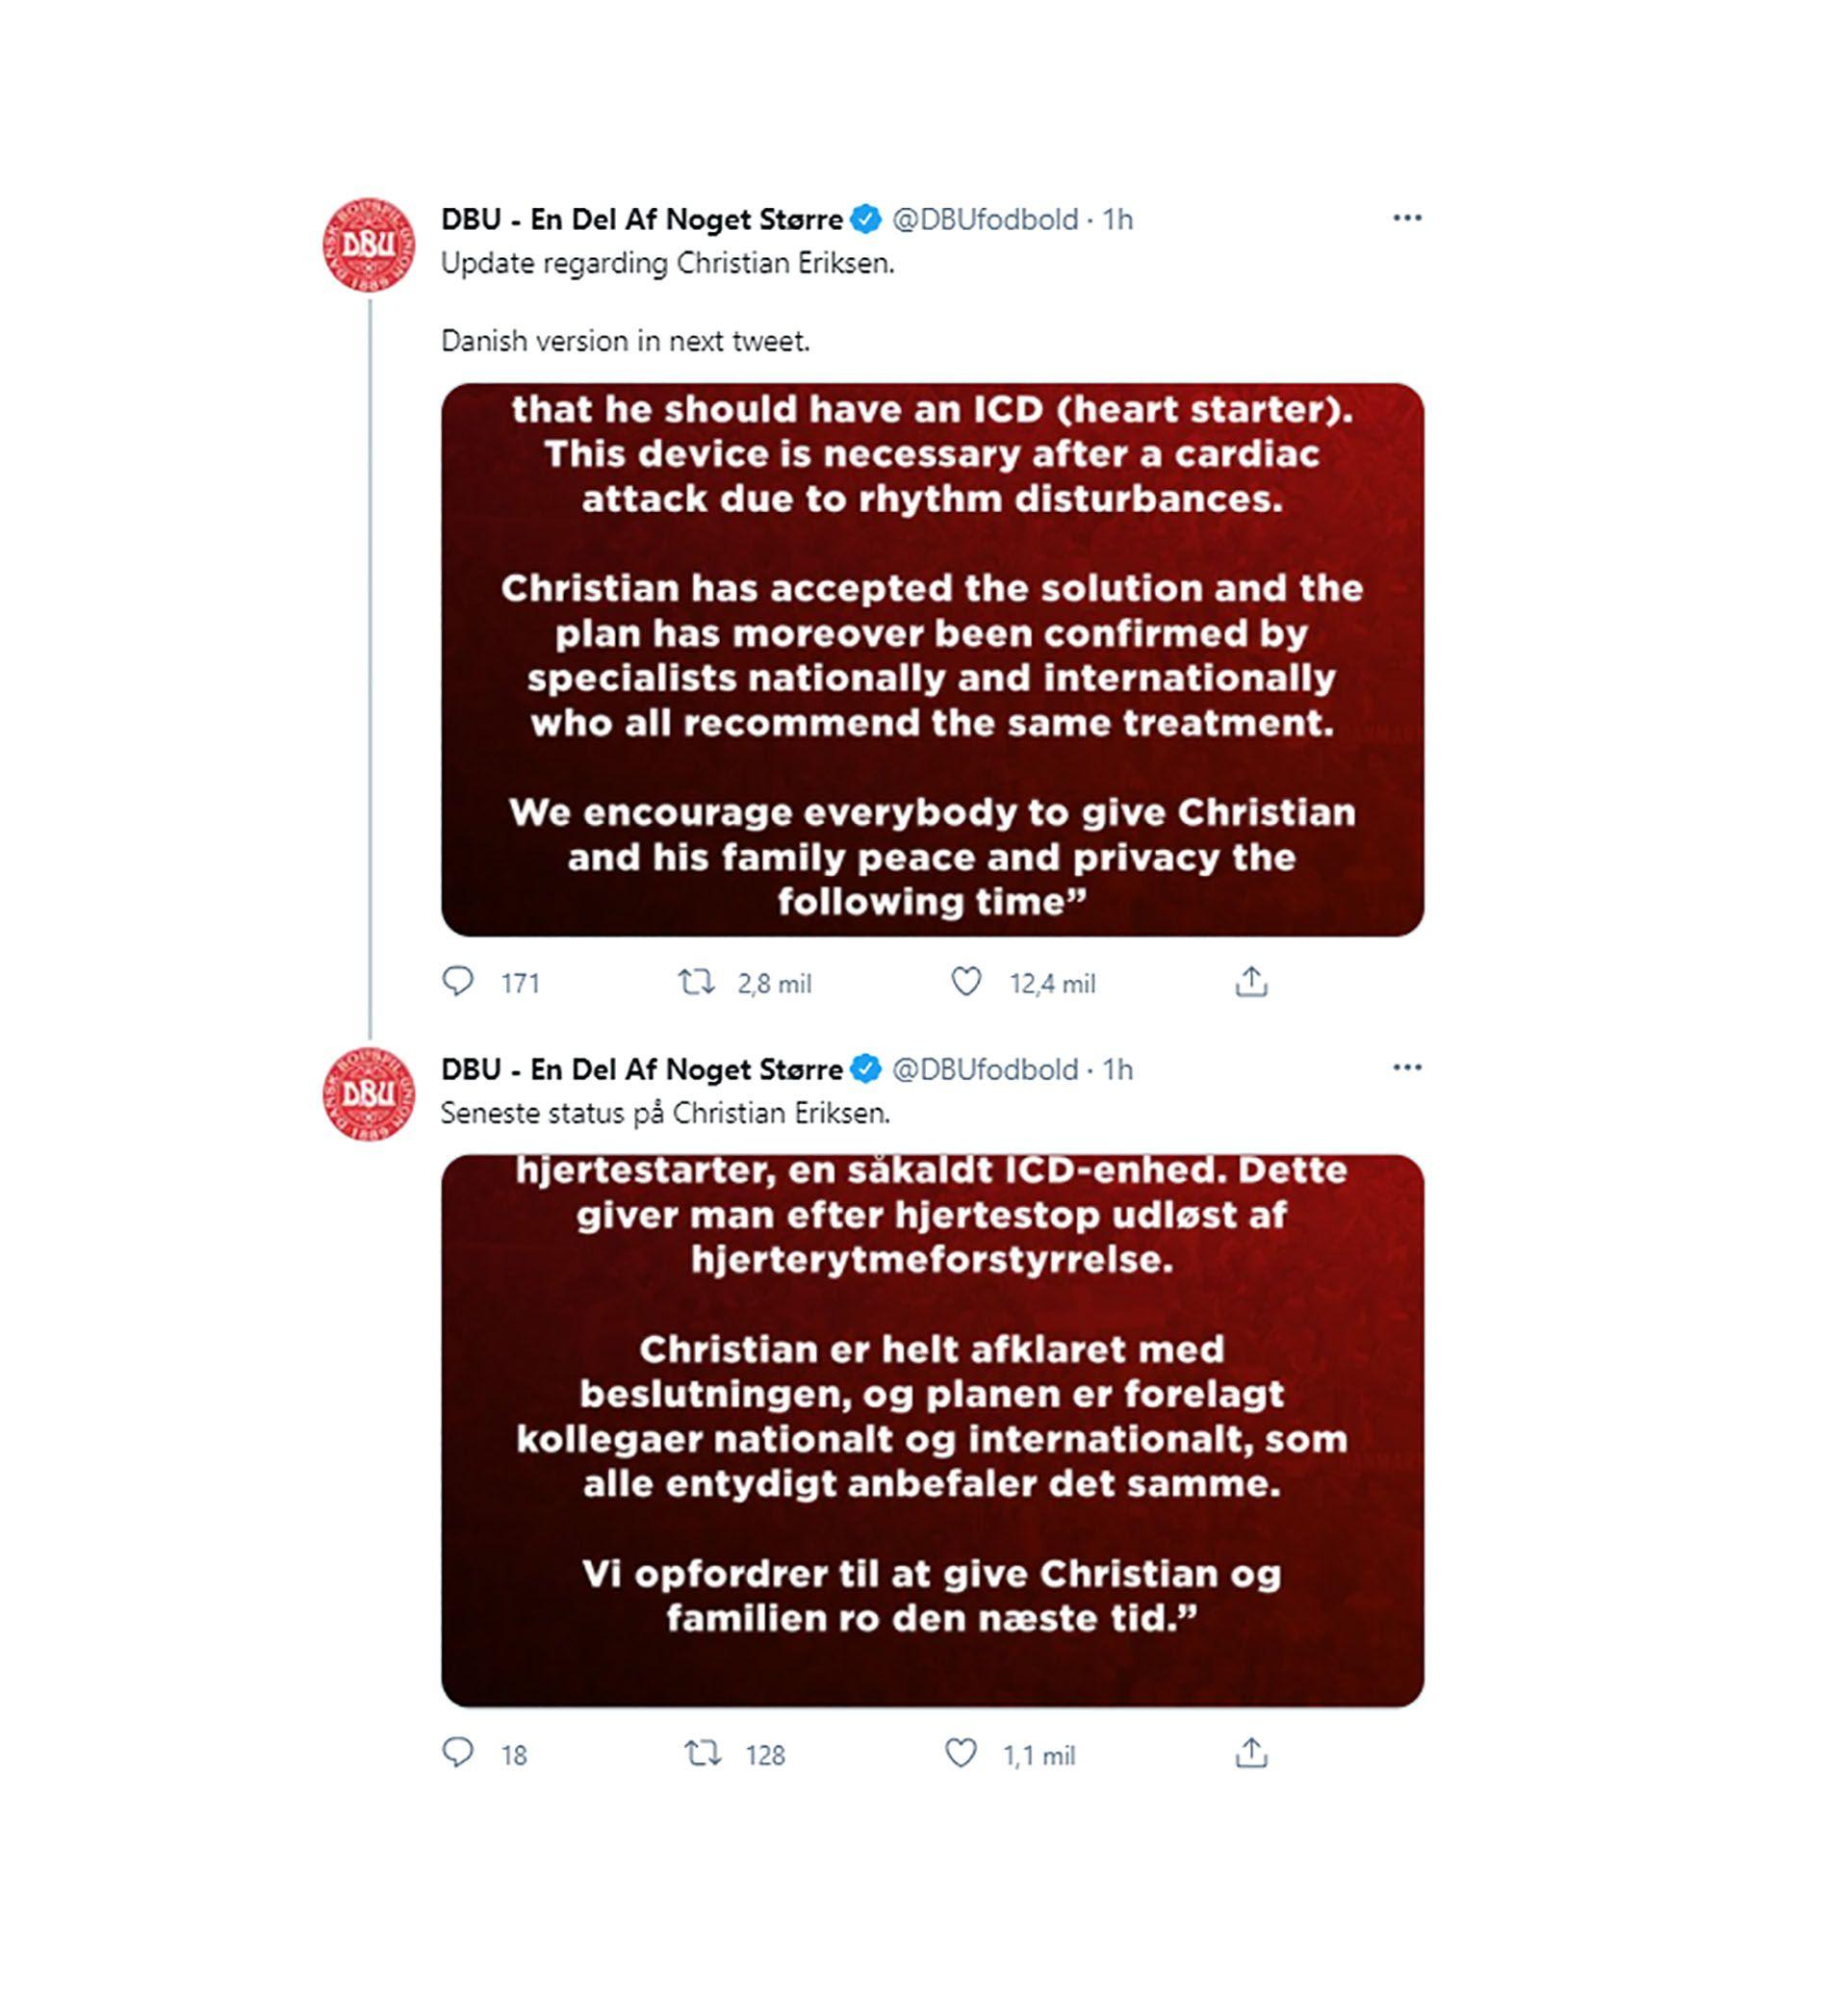 Captura - Tuit sobre operacion de corazon a Eriksen